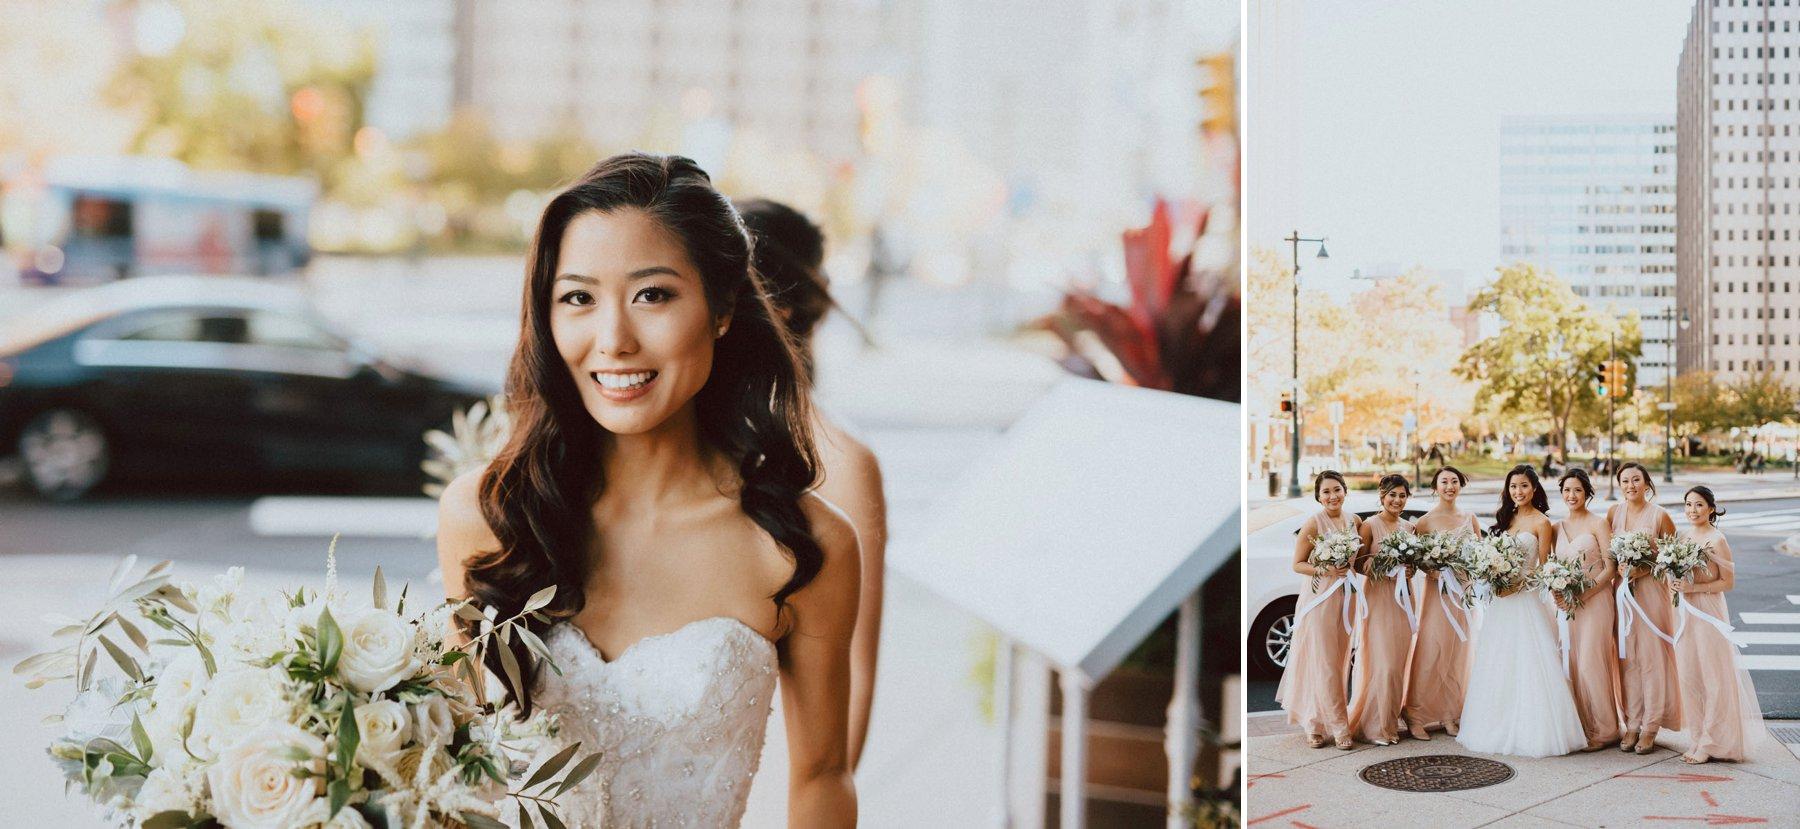 philadelphia-wedding-photographer-24.jpg